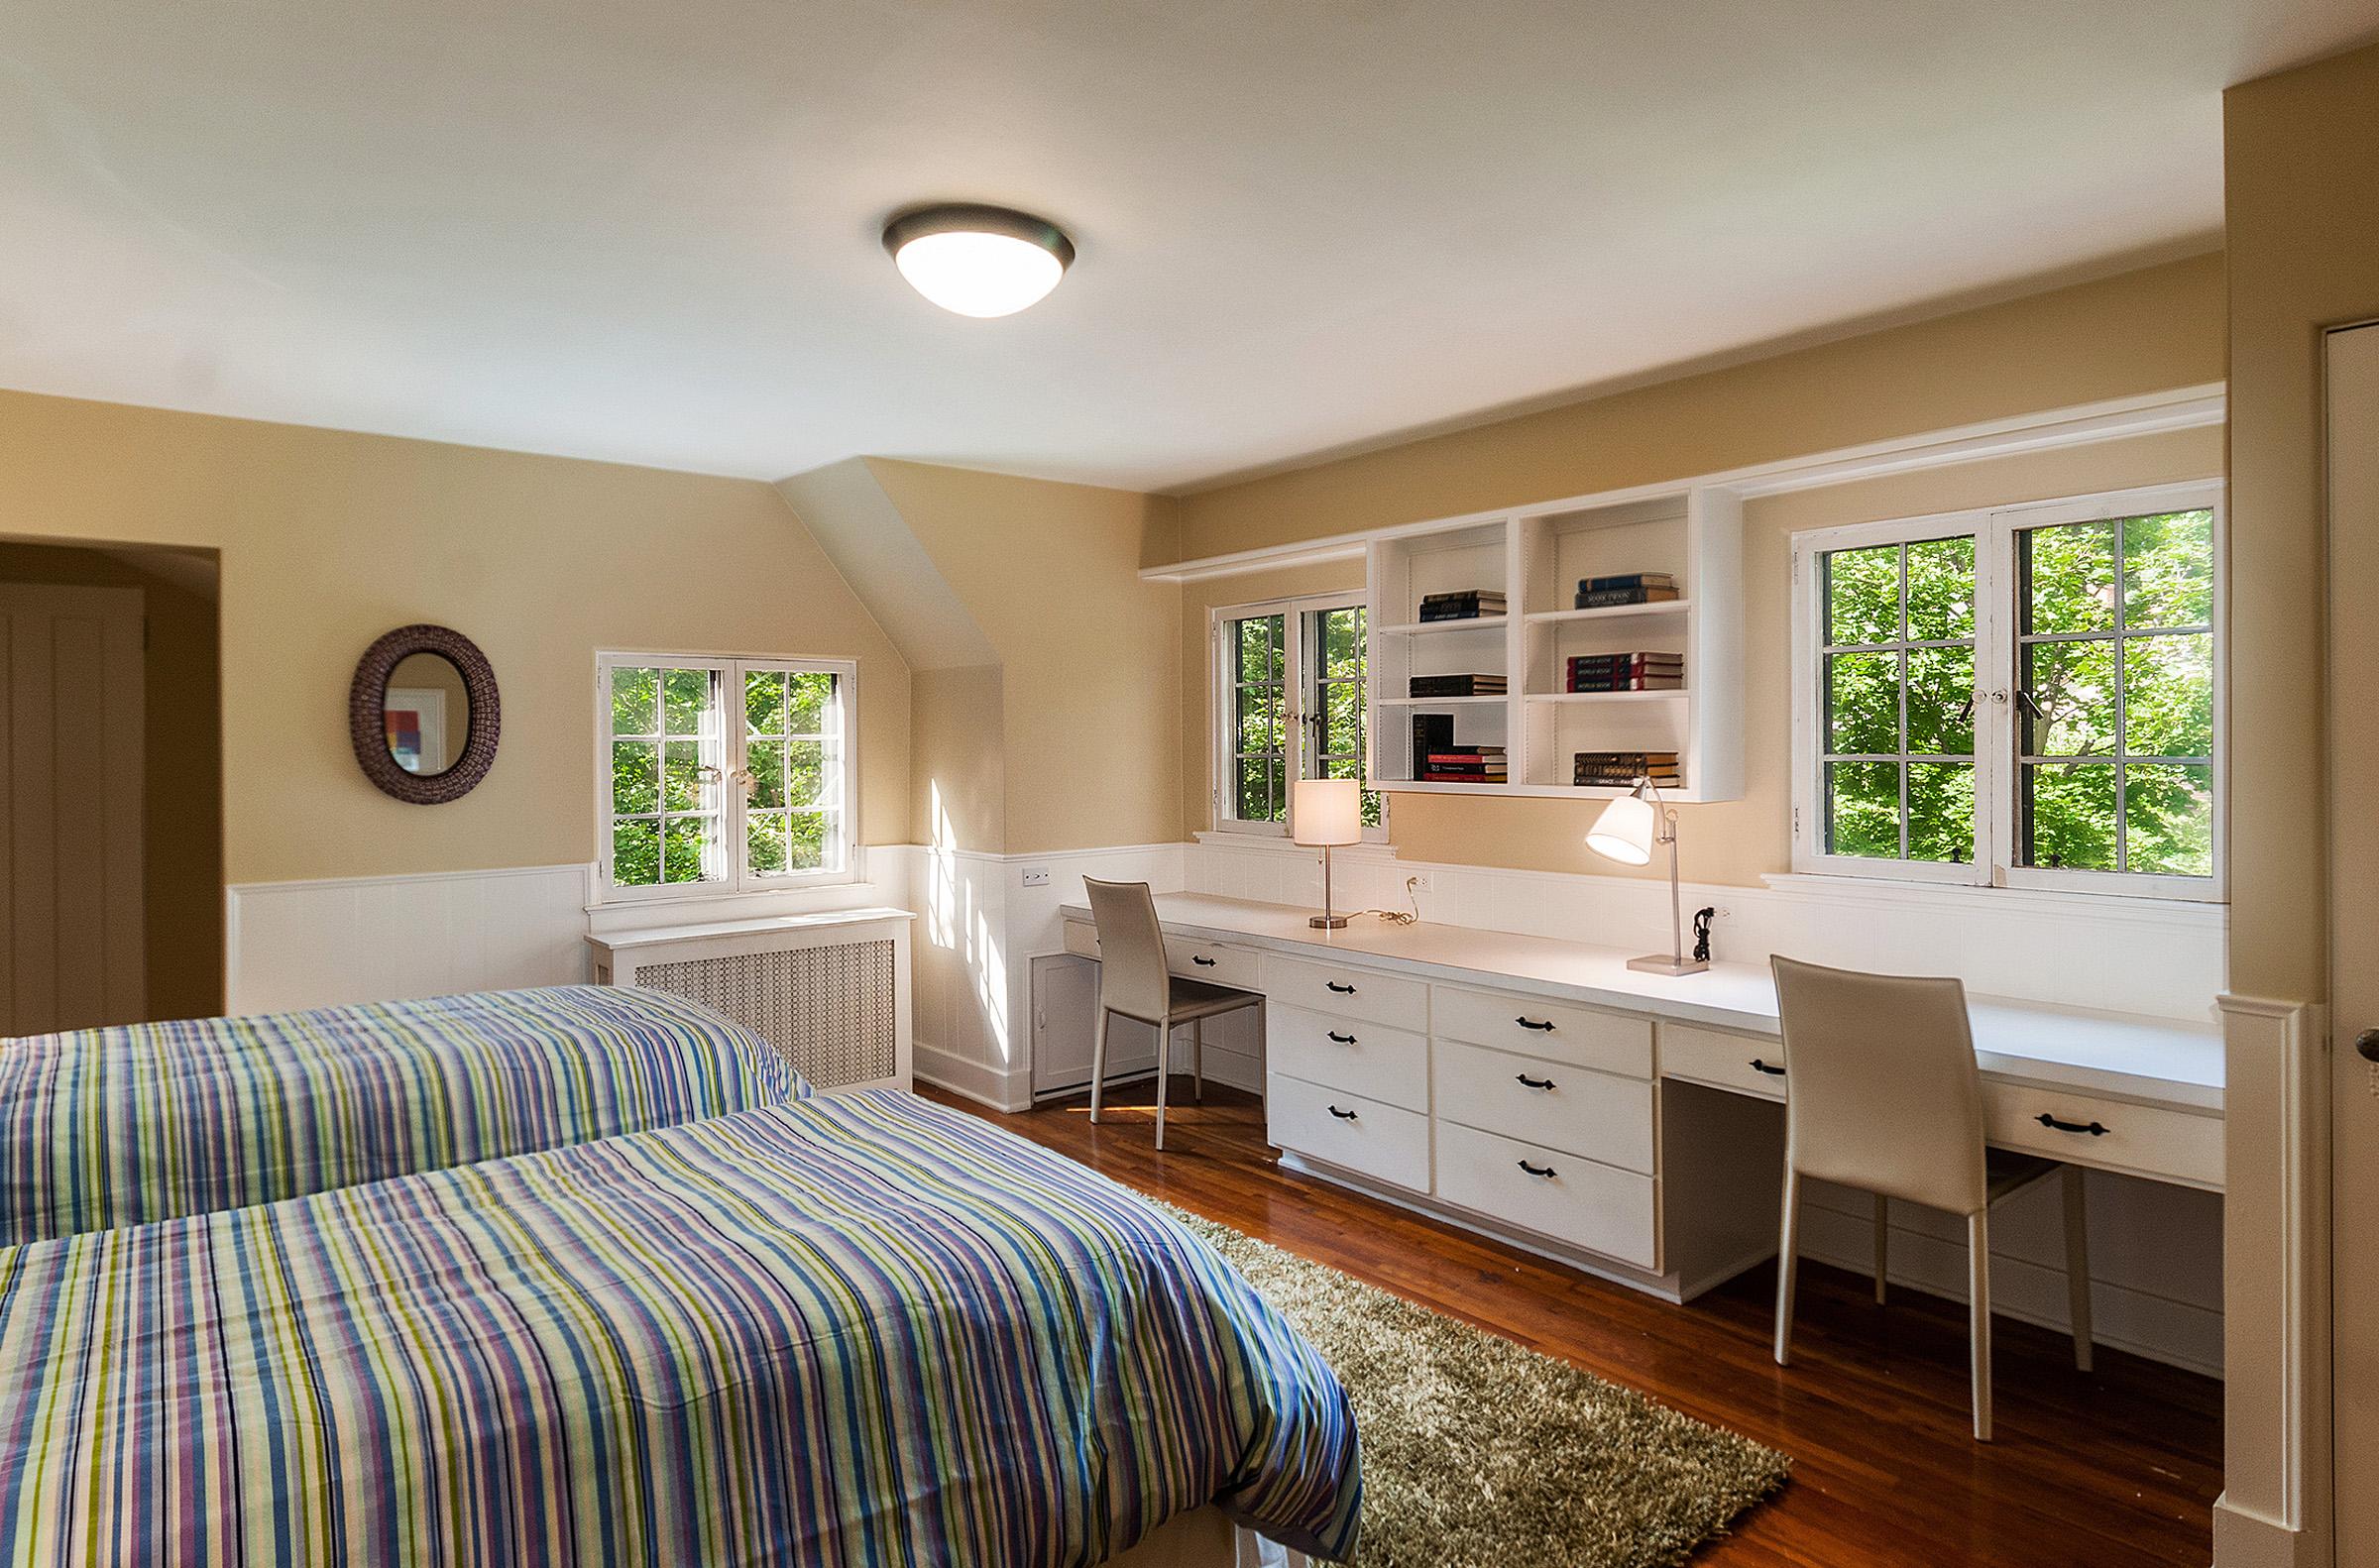 1087624_Bedroom-Two-with-Built-in-Desks_high.jpg